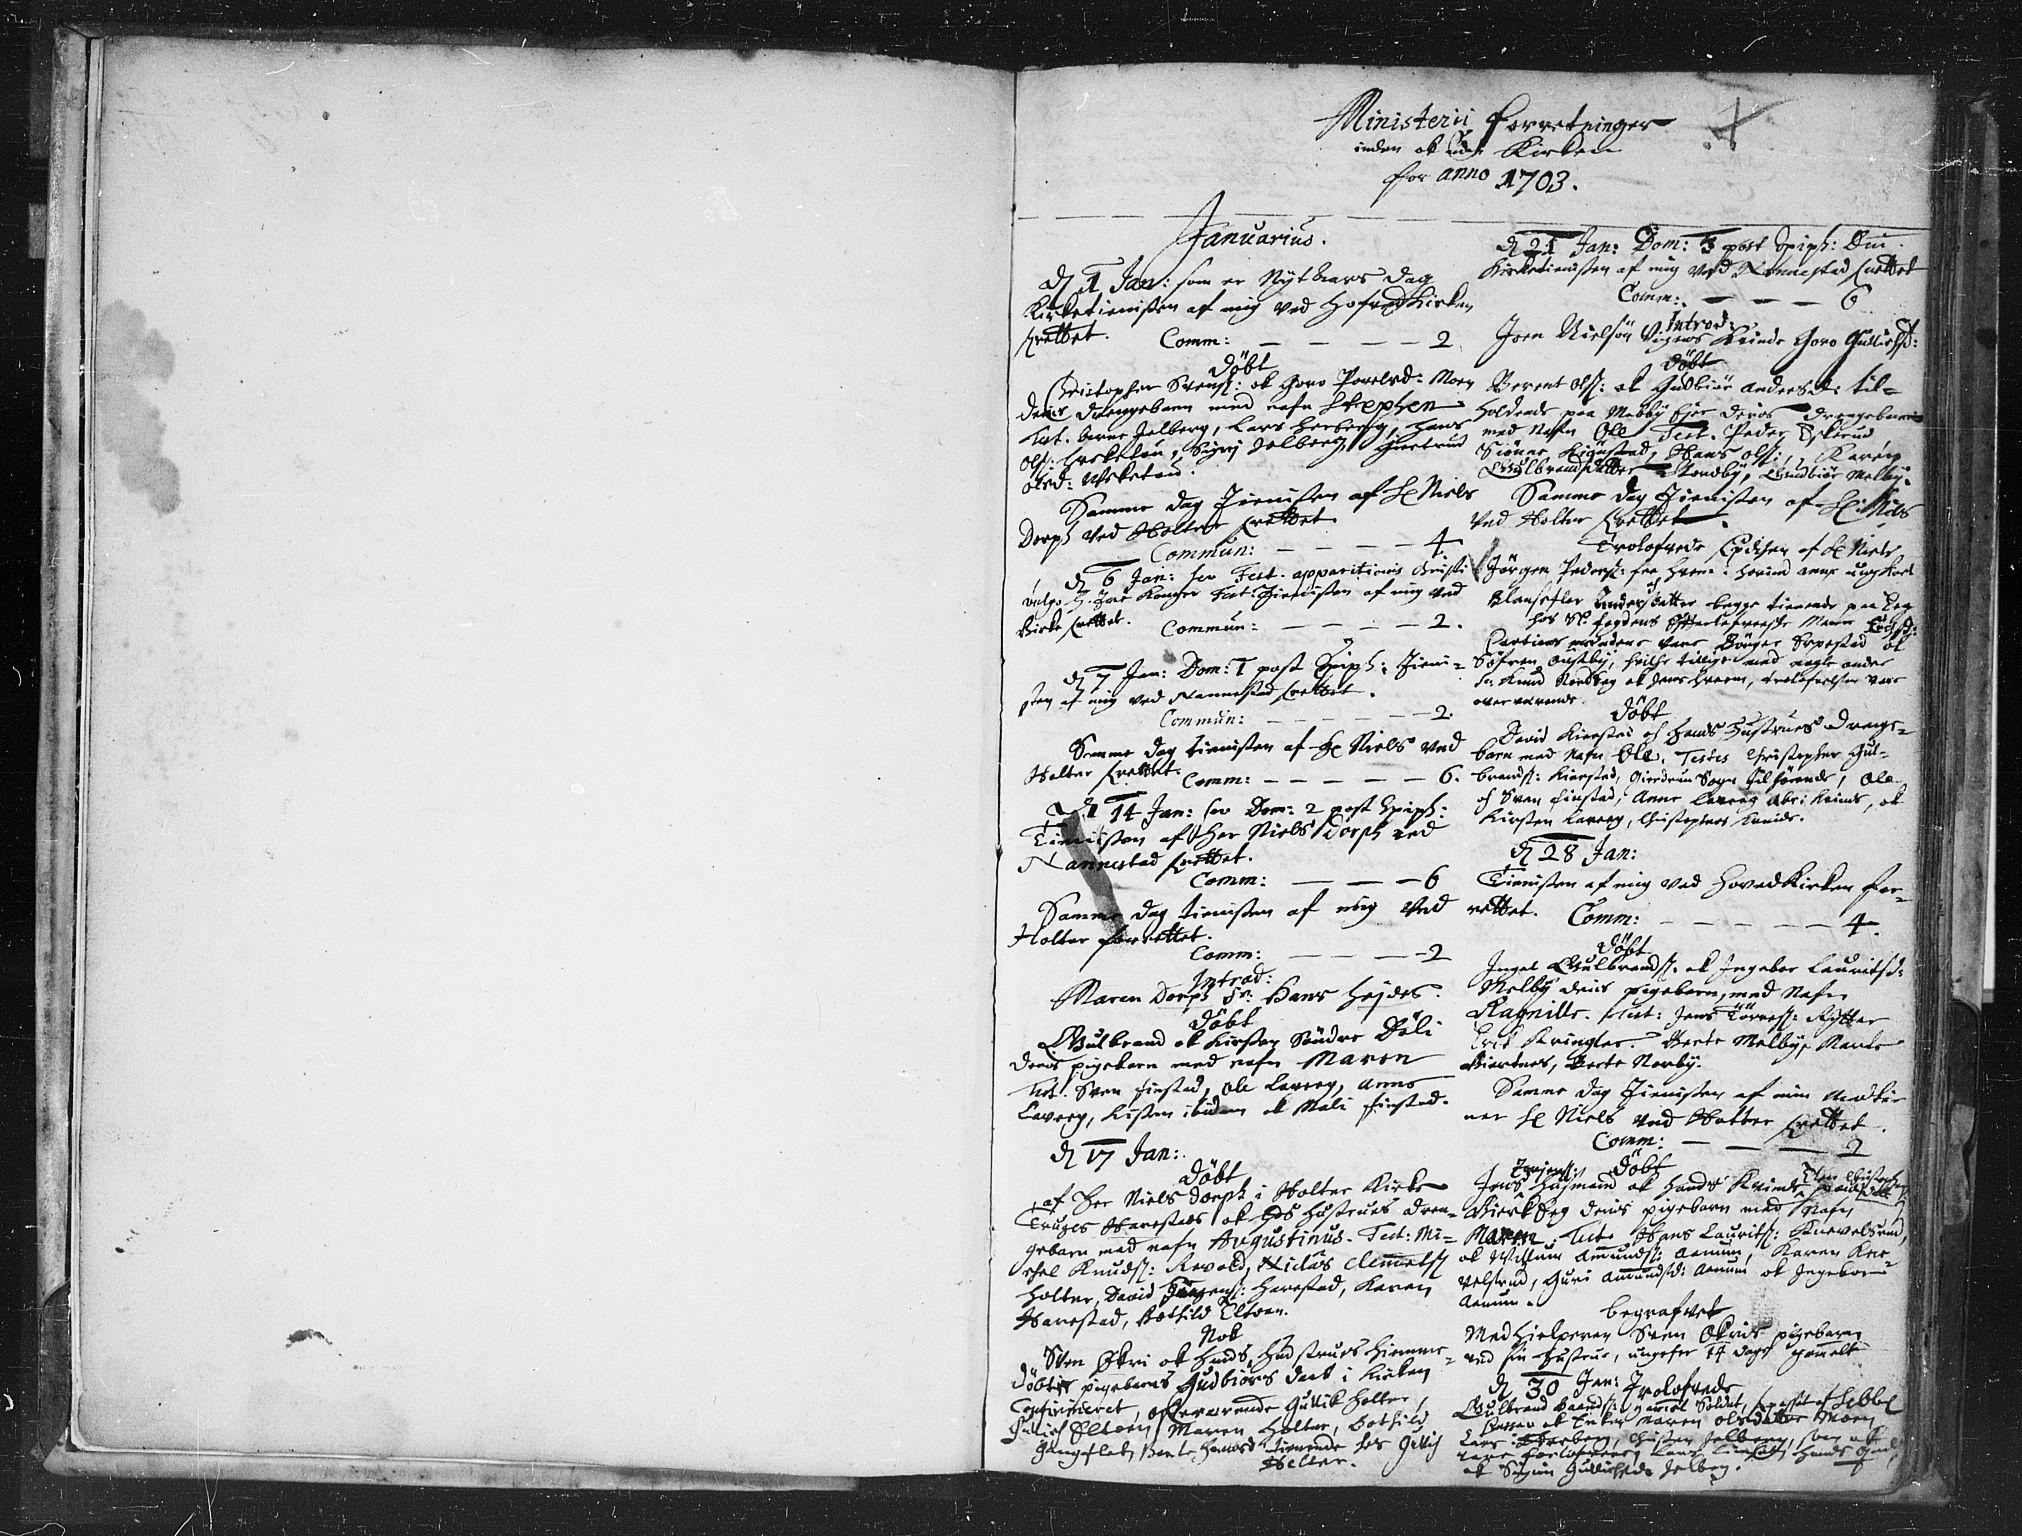 SAO, Nannestad prestekontor Kirkebøker, F/Fa/L0002: Ministerialbok nr. I 2, 1703-1715